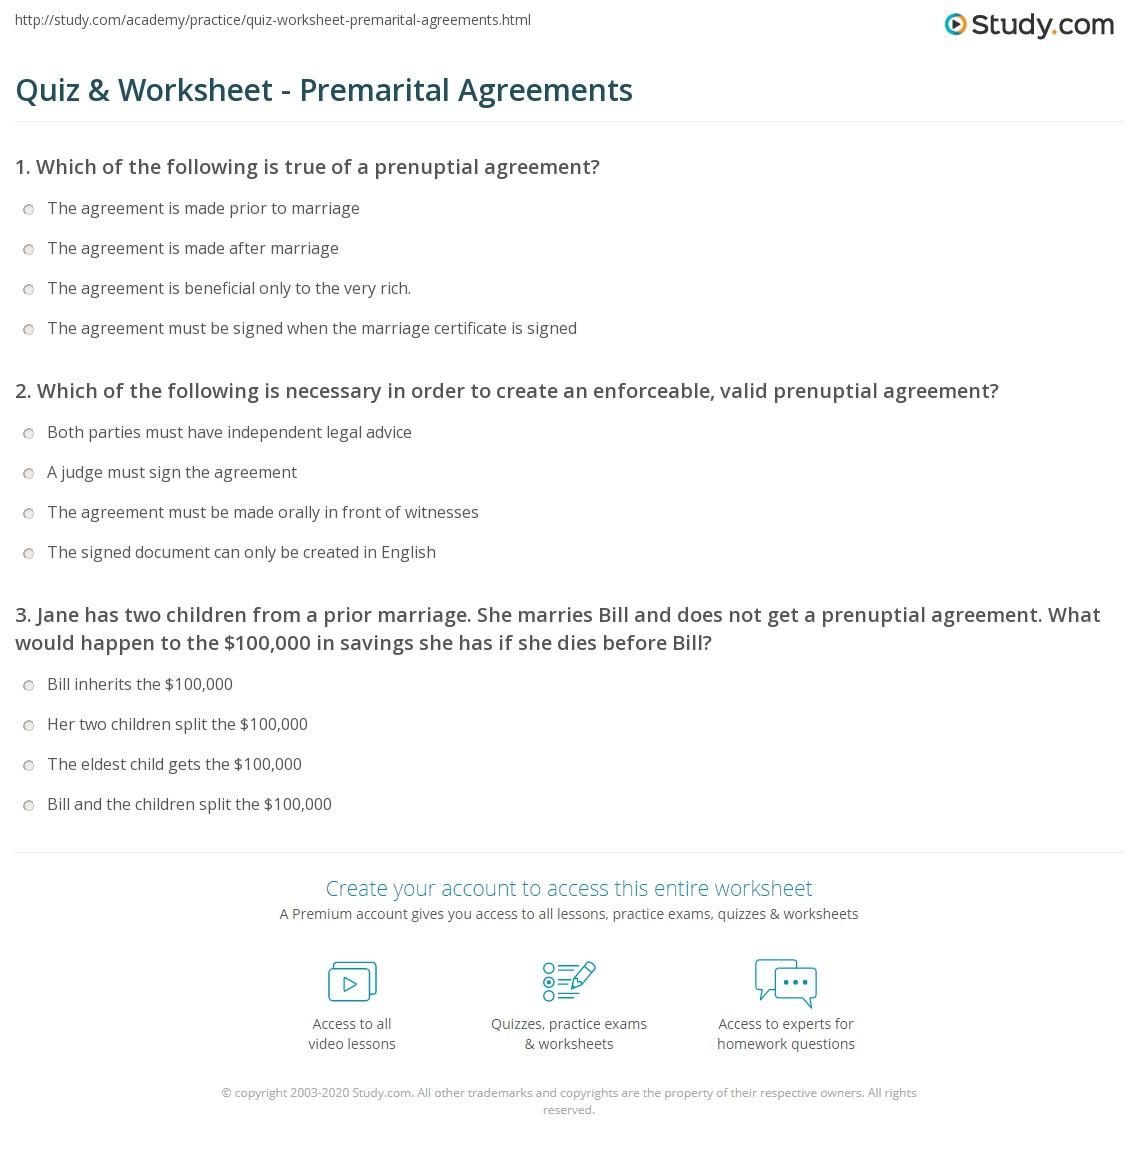 Quiz Worksheet Premarital Agreements Study